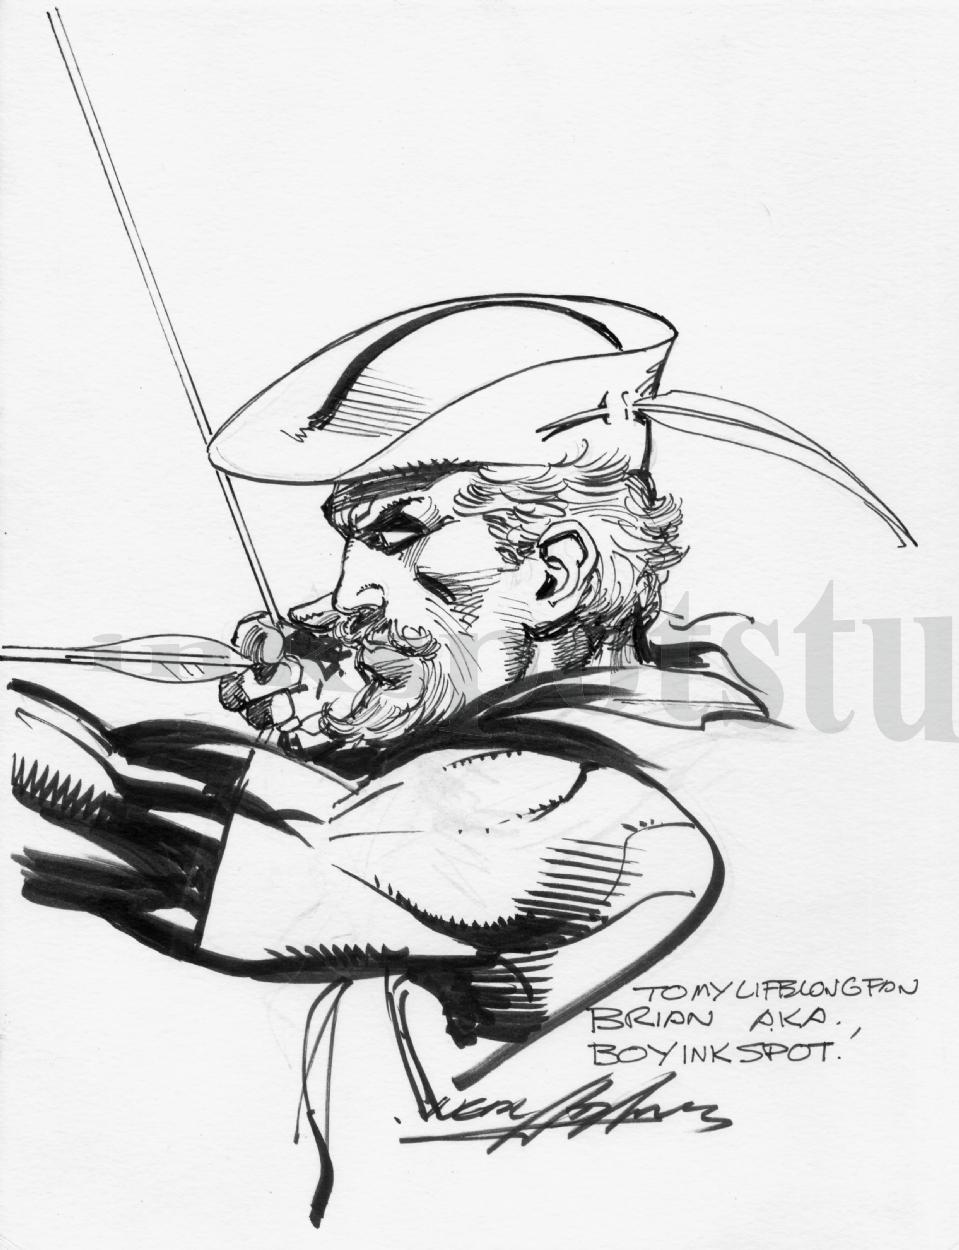 959x1250 Neal Adams Green Arrow Sketch, In Brian G. Mckenna's Permanent